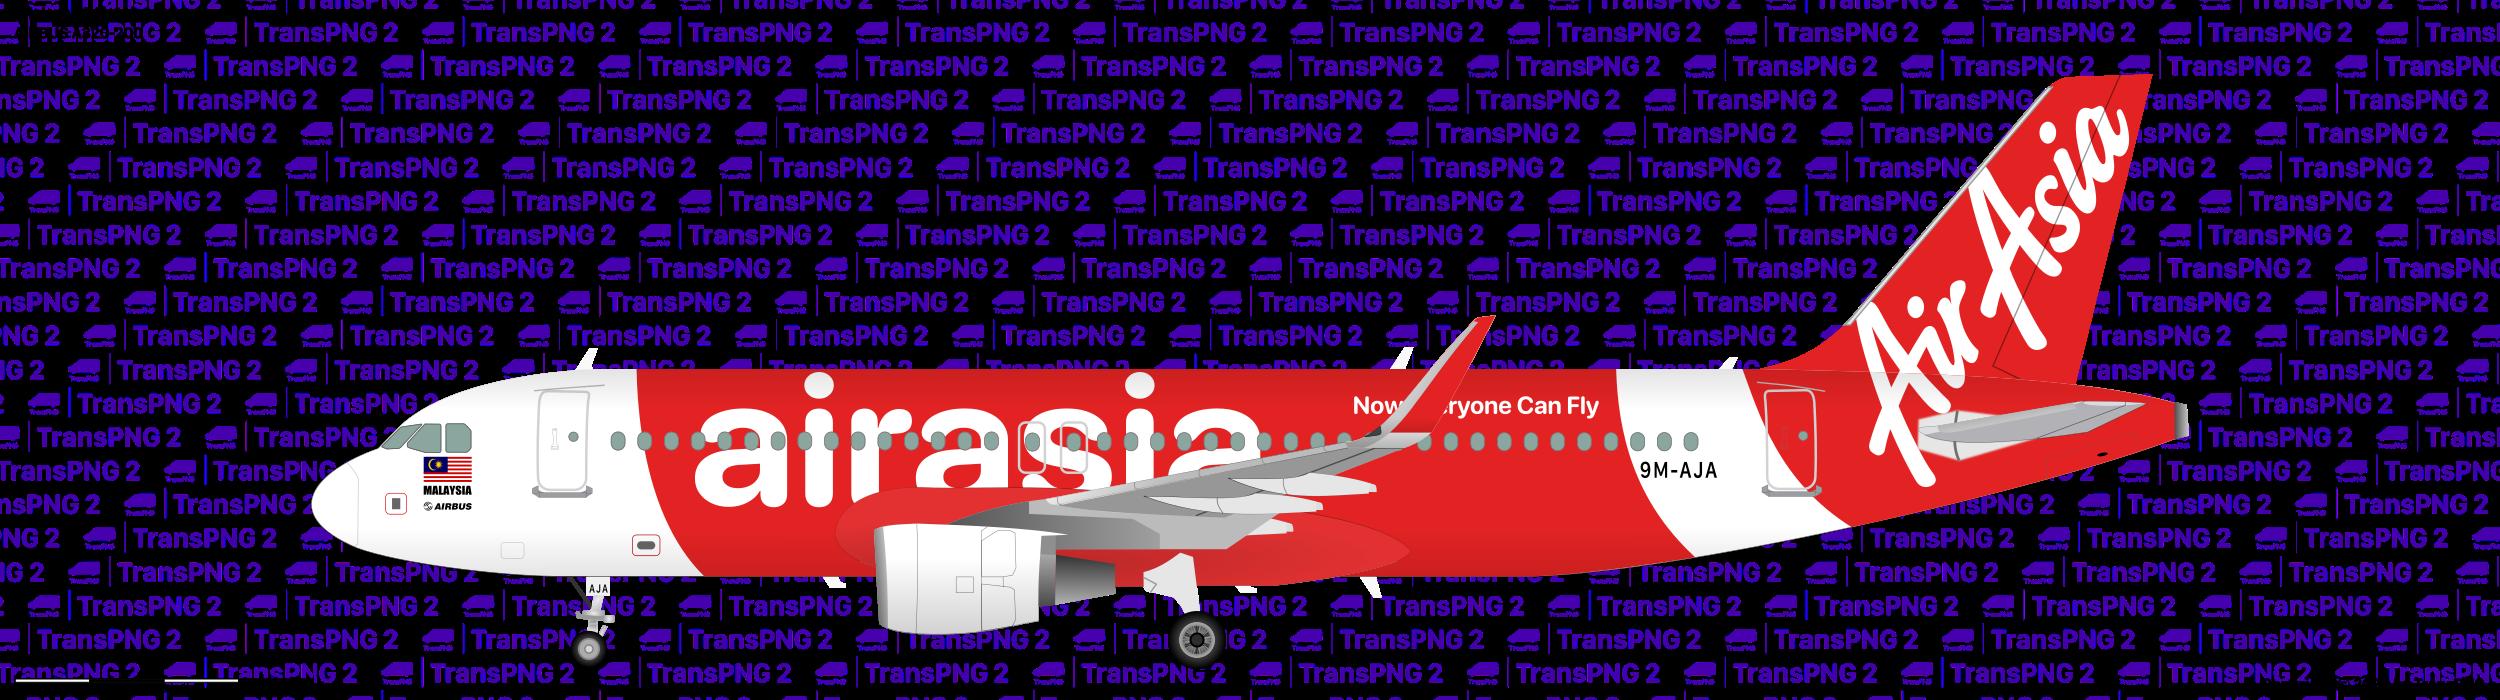 Airplane 25112